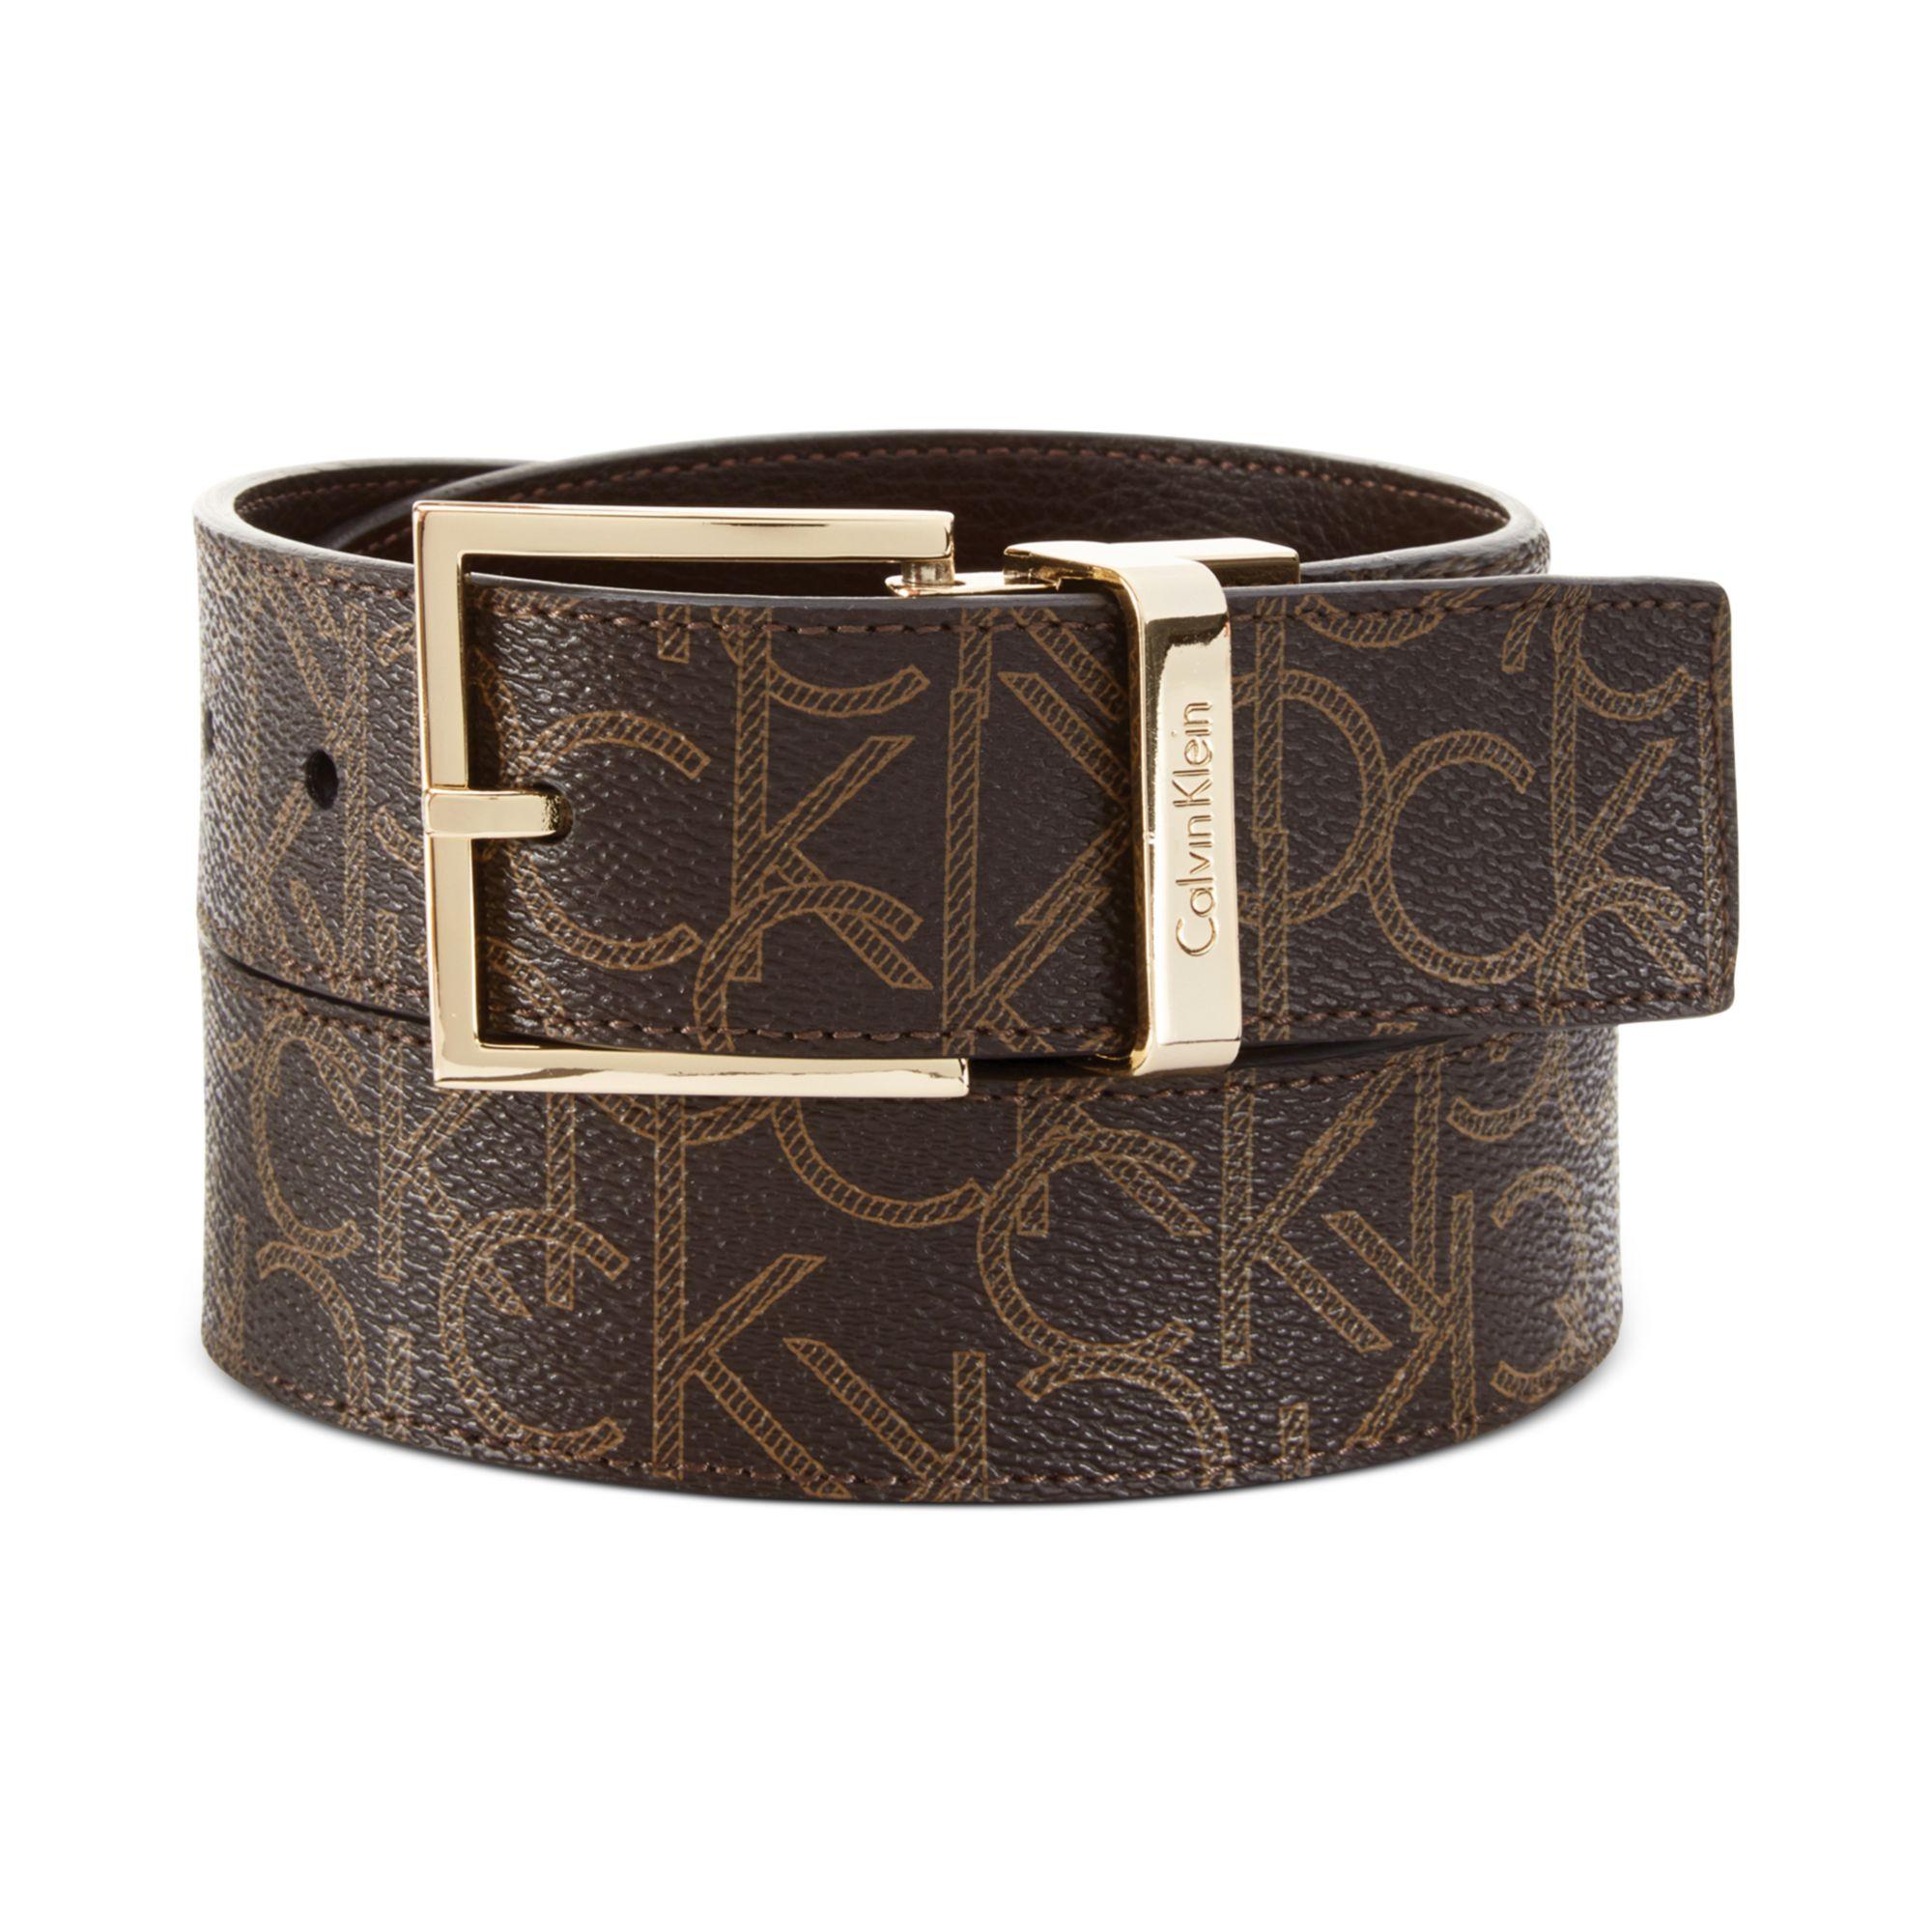 calvin klein reversible logo belt in brown chocolate lyst